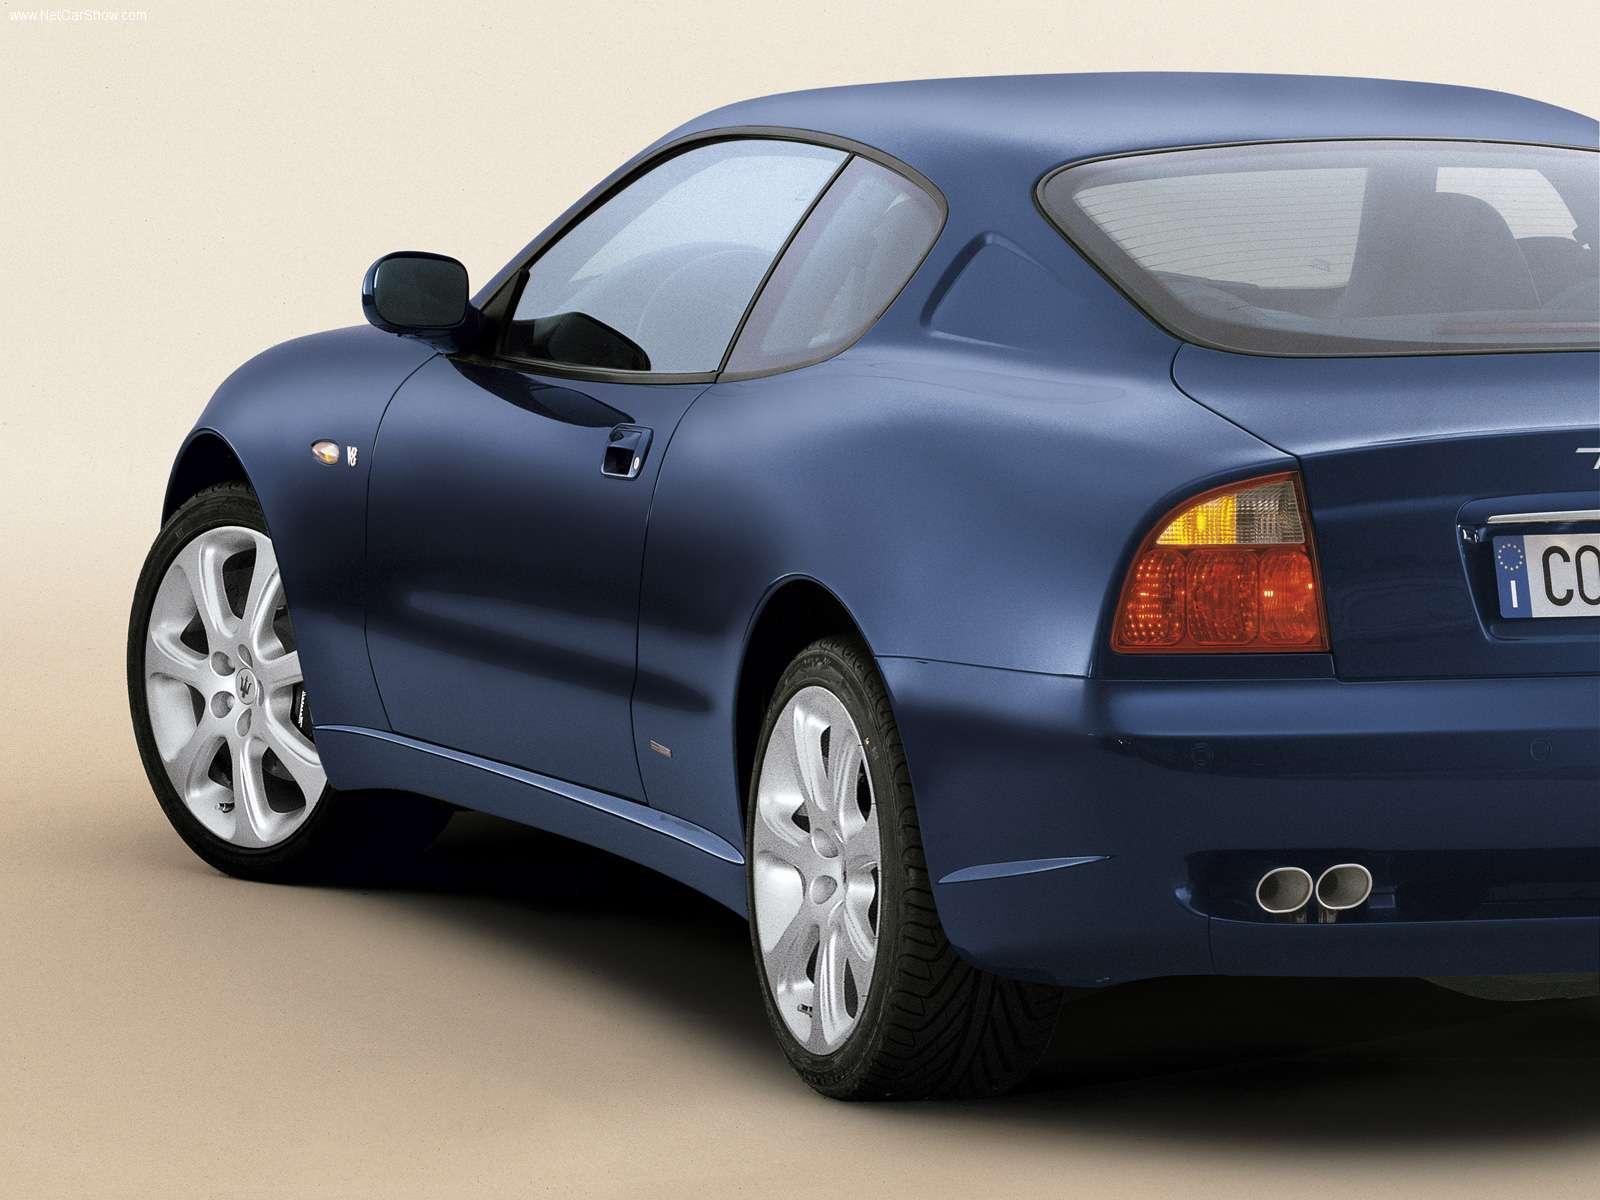 Hình ảnh siêu xe Maserati Coupe 2003 & nội ngoại thất